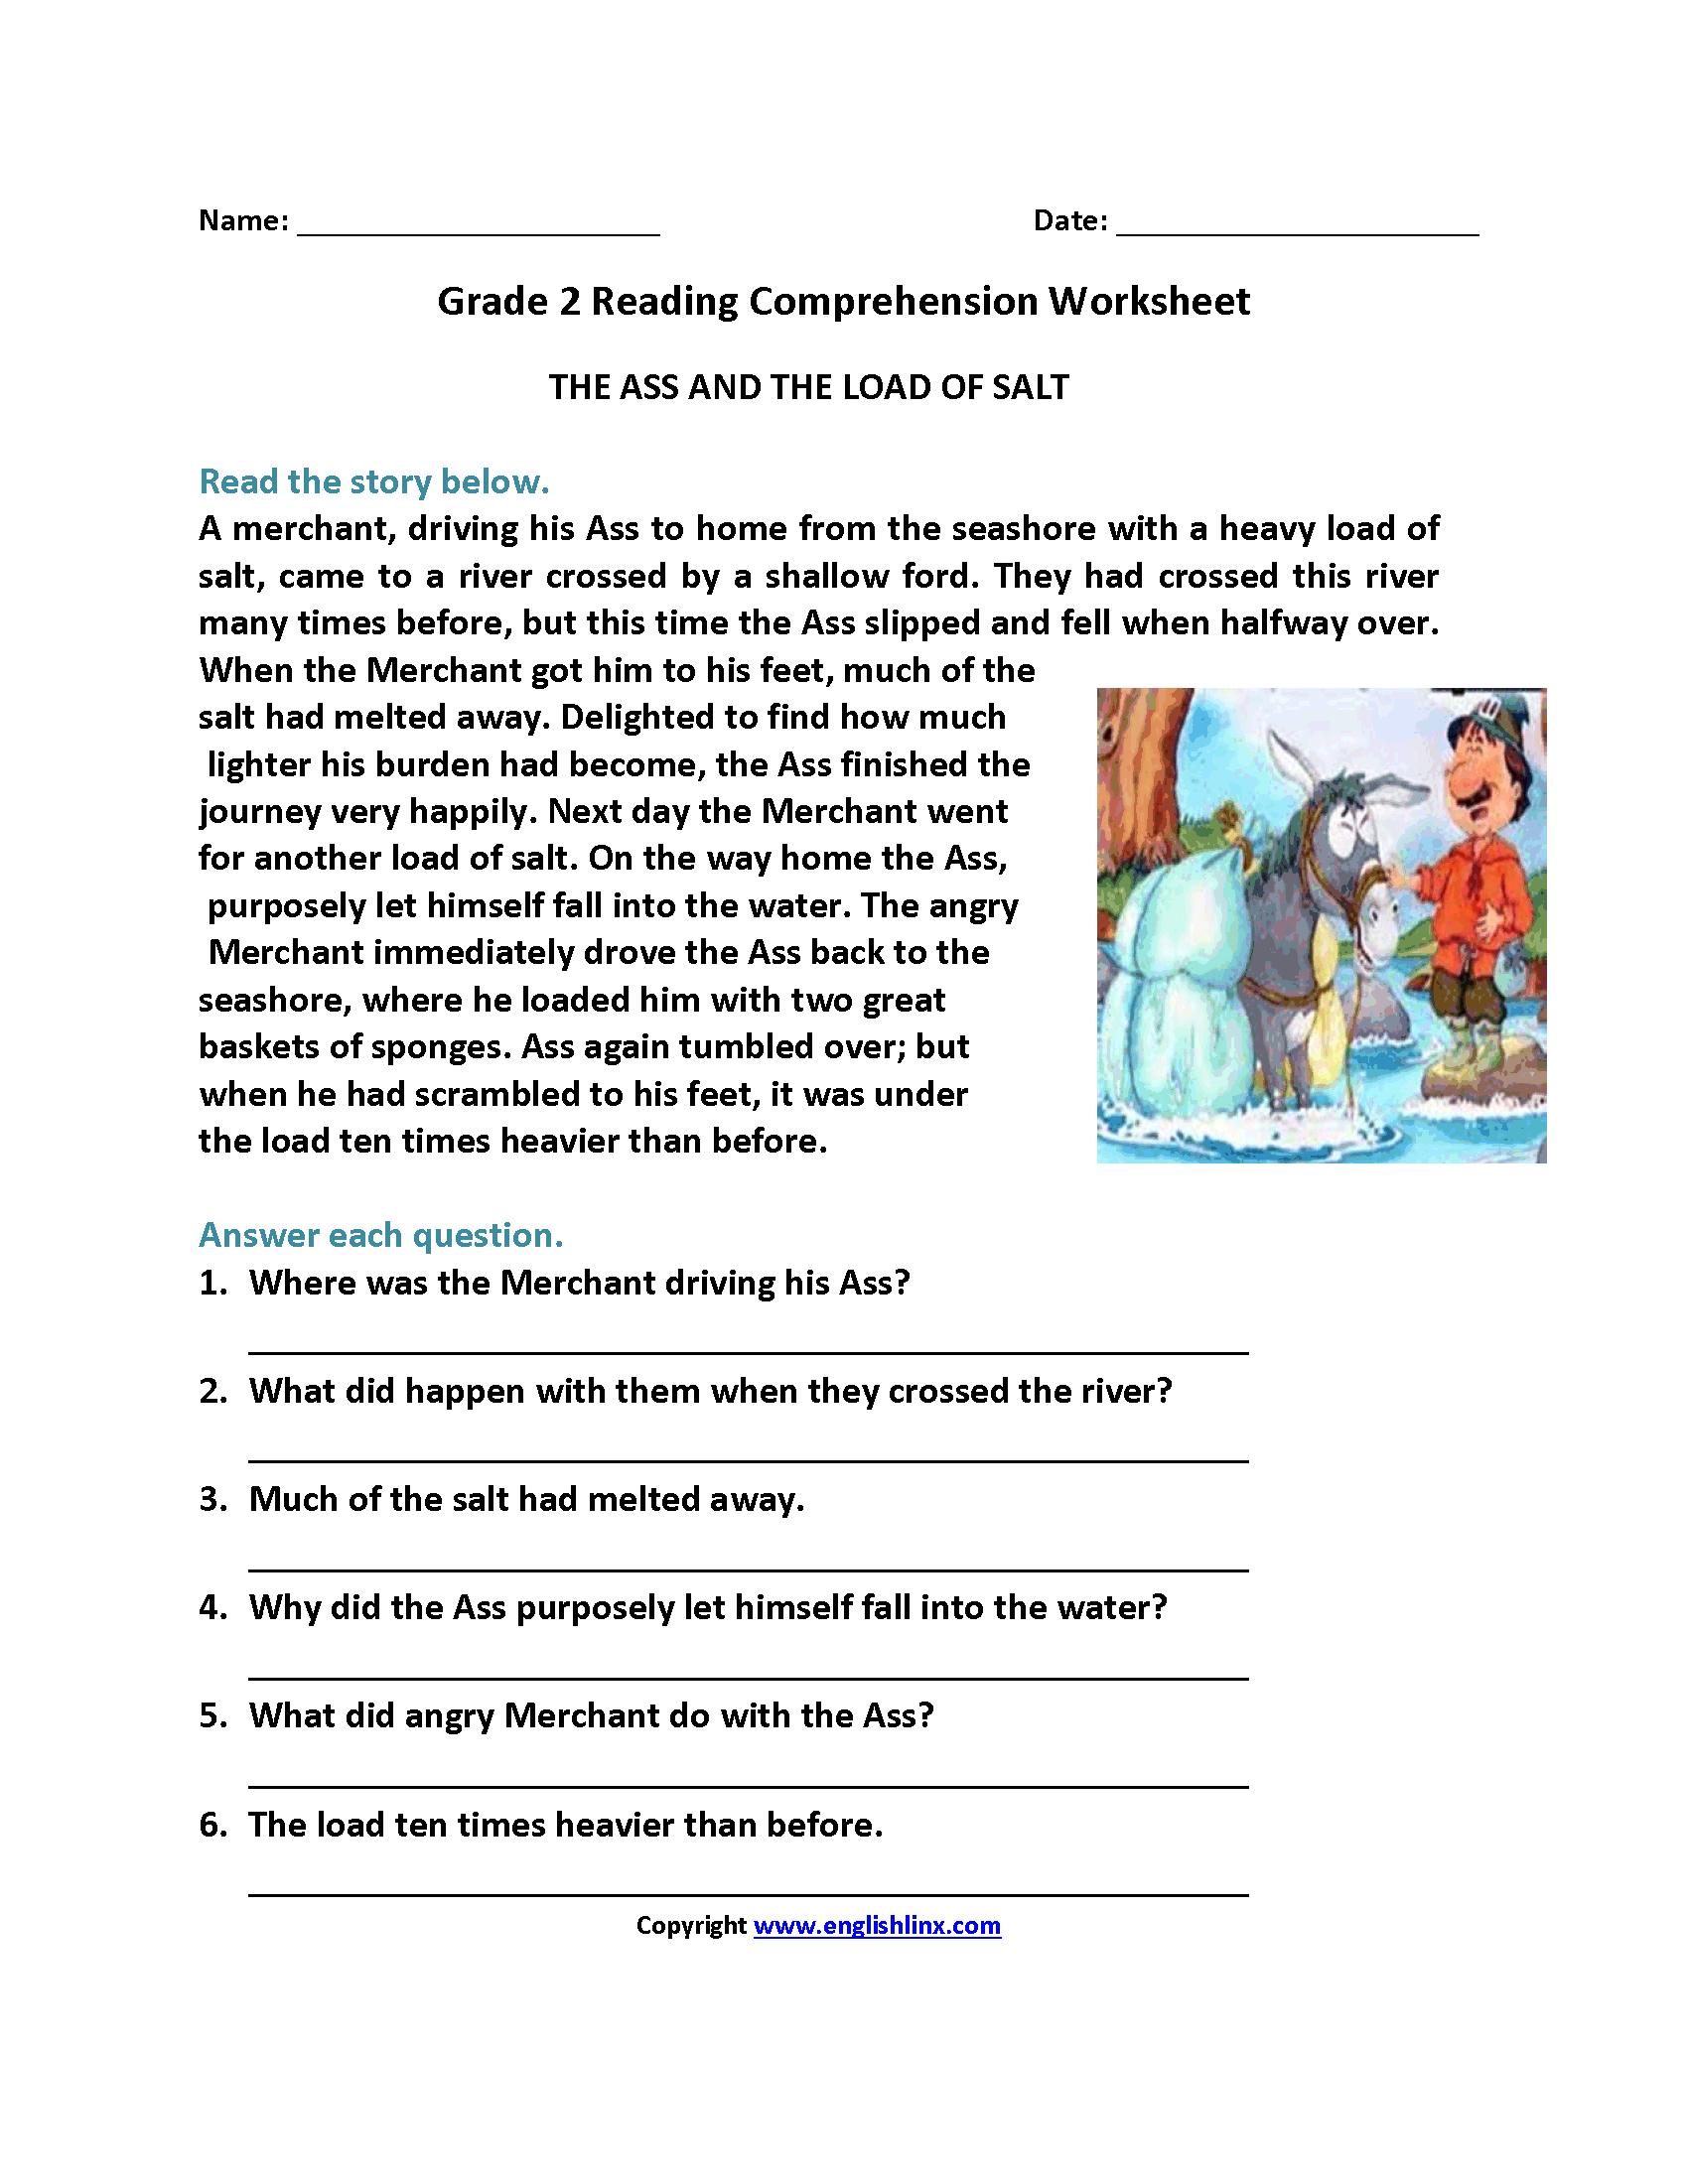 Reading Worksheets   Second Grade Reading Worksheets   Reading  comprehension worksheets [ 2200 x 1700 Pixel ]